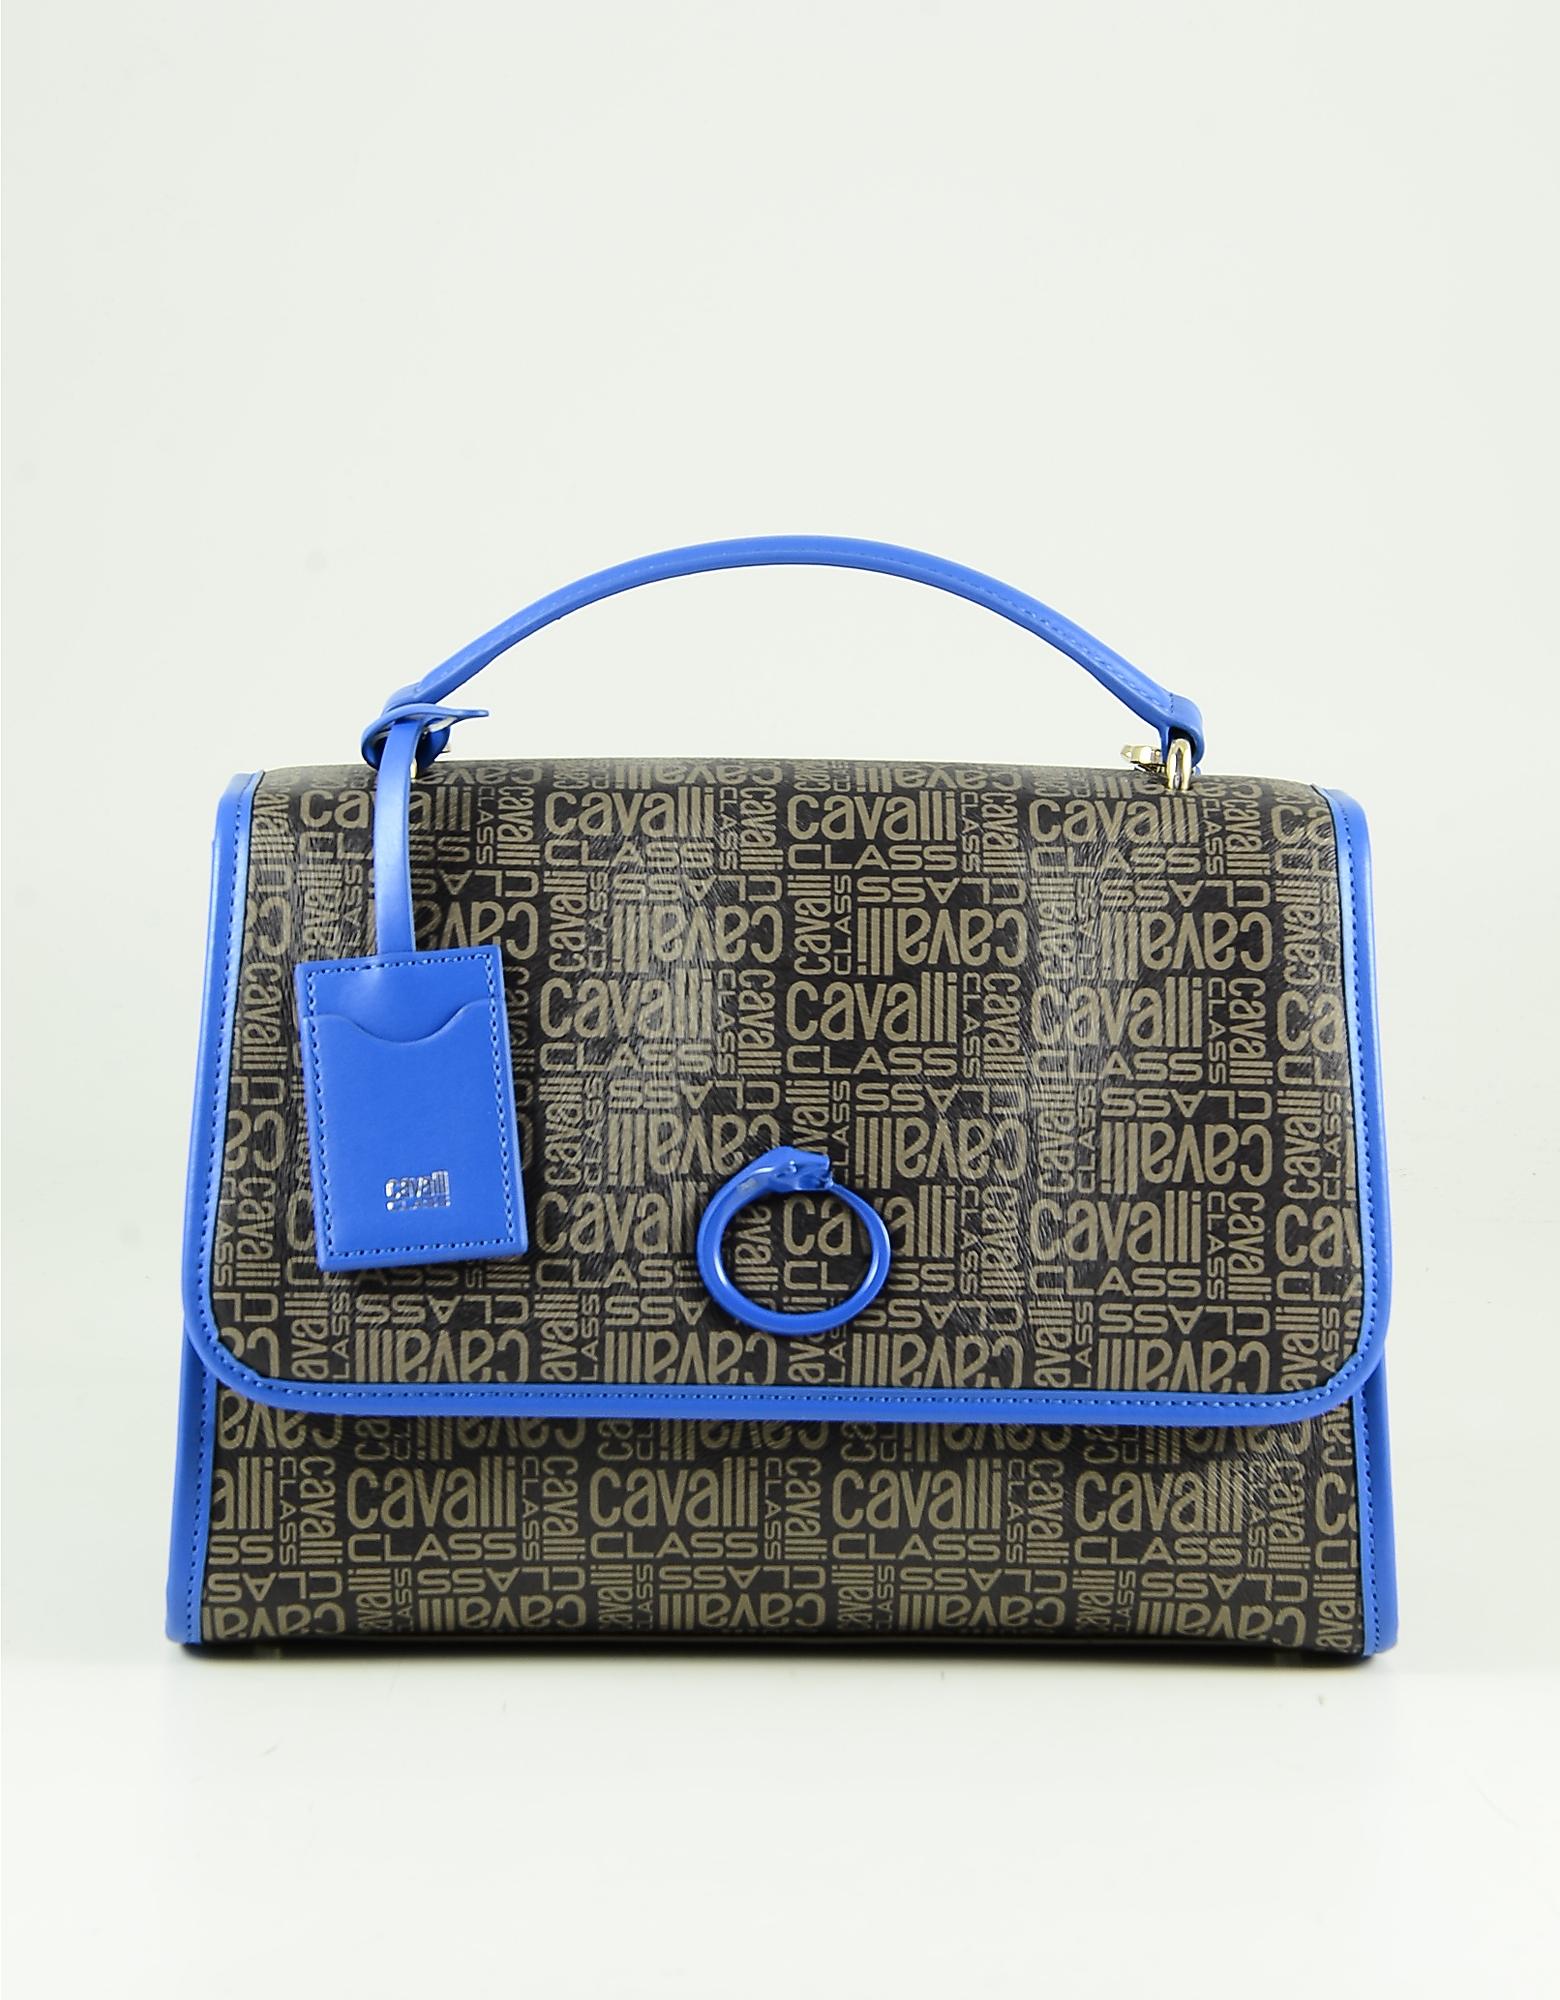 Class Roberto Cavalli Brown & Blue Signature Print Satchel Bag